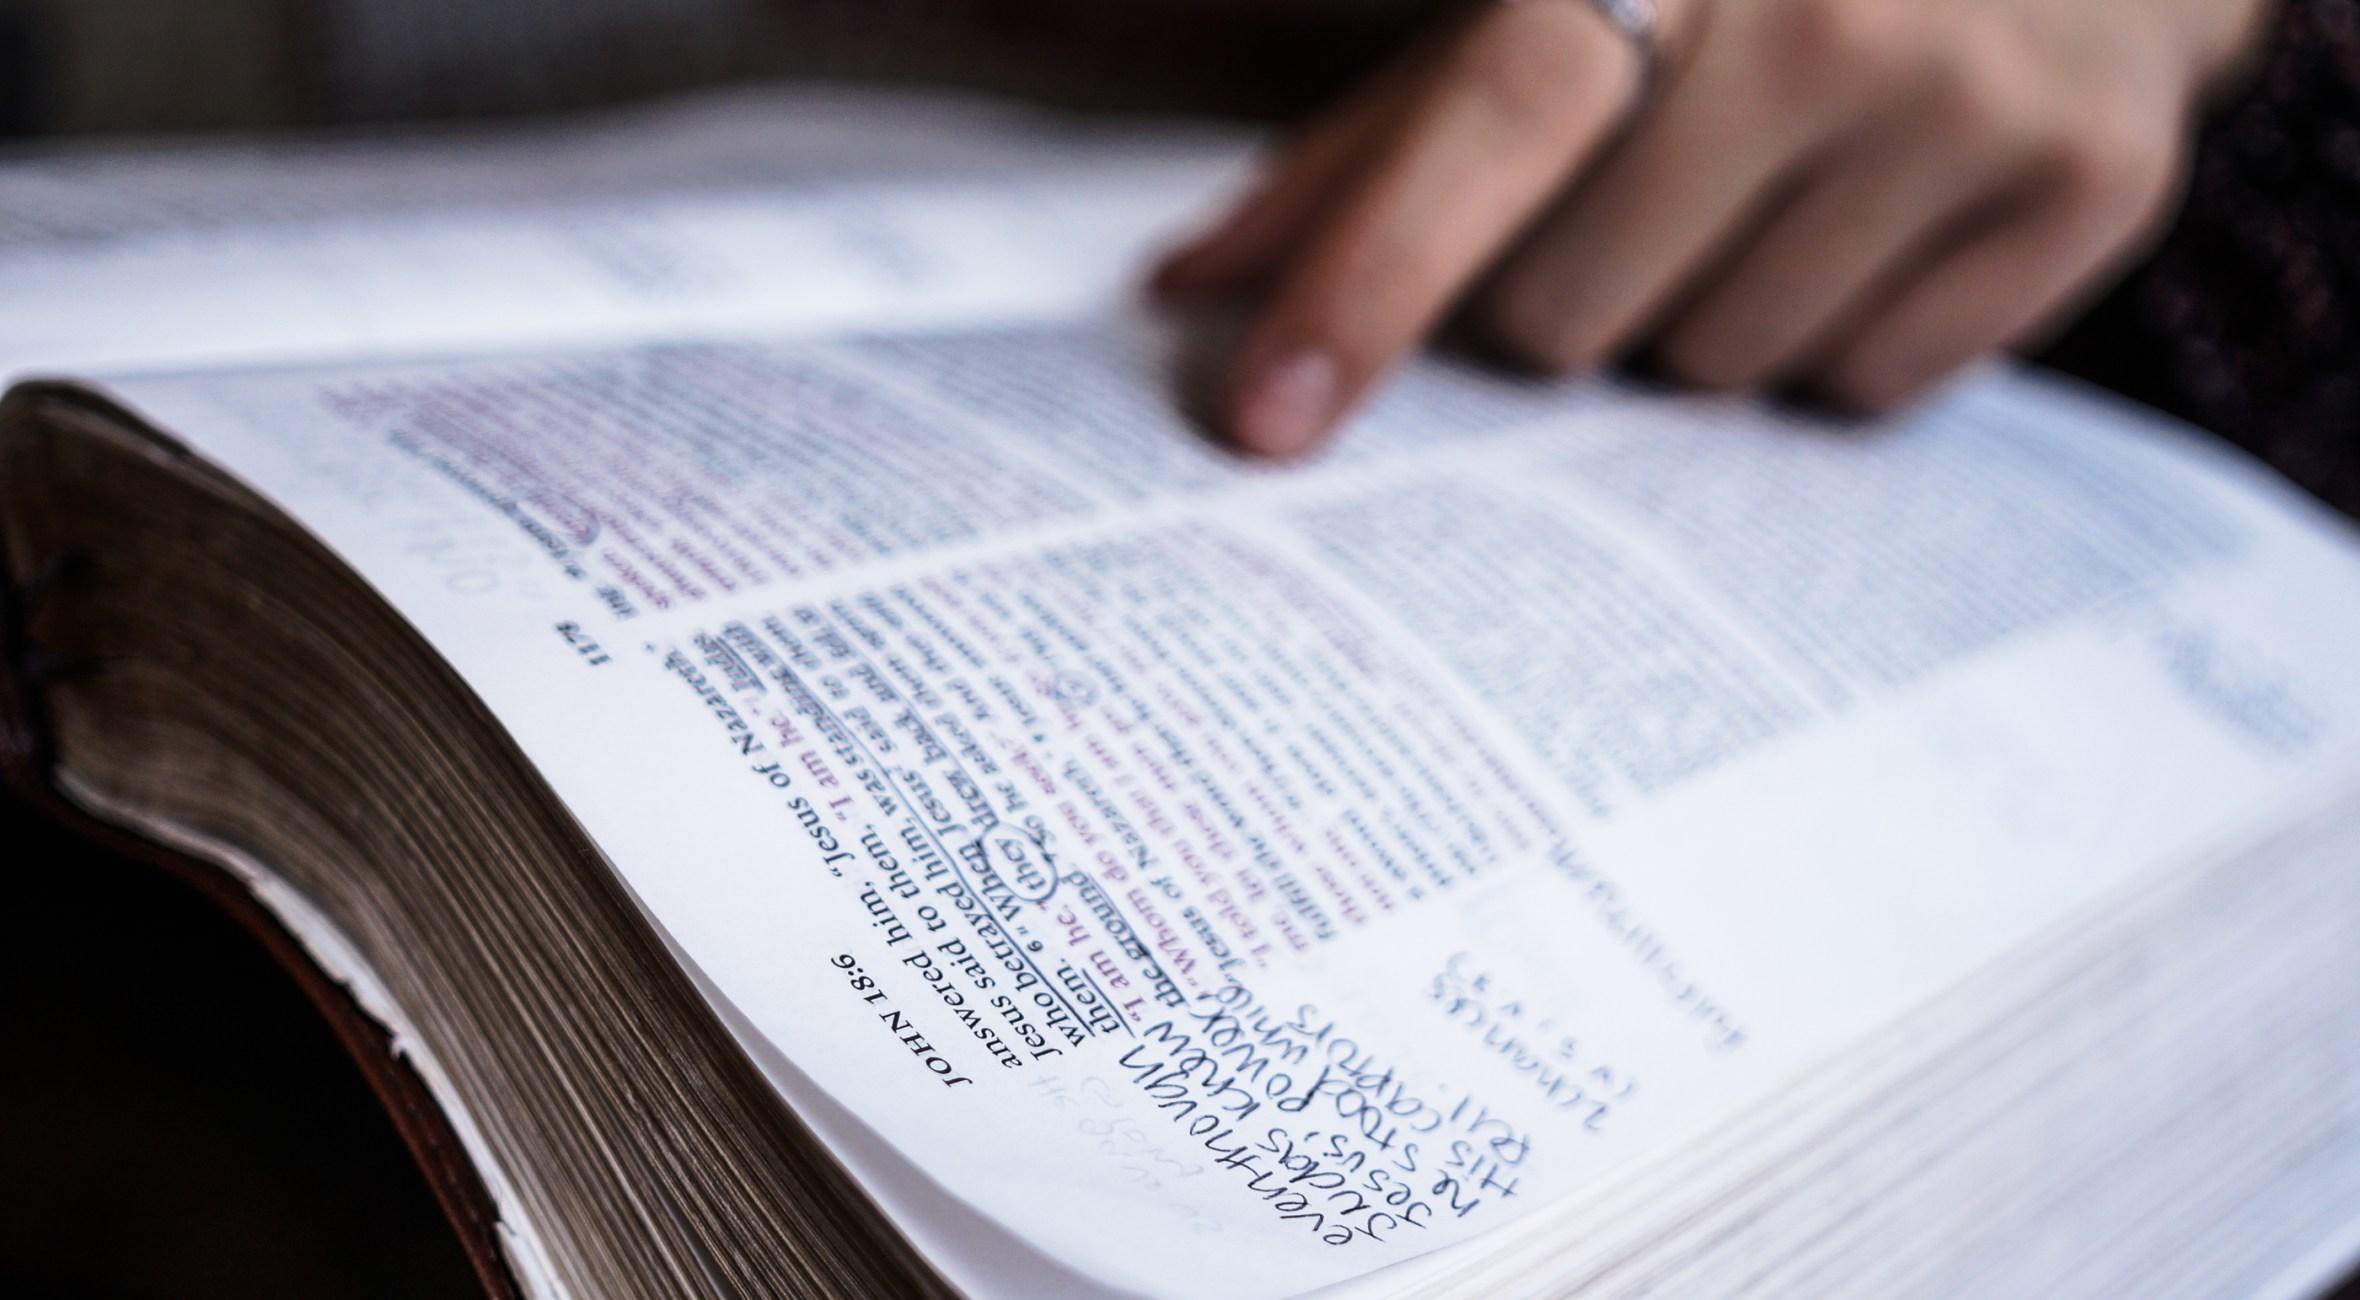 THE INEVITABLE DISORIENTATION OF BIBLICAL ILLITERACY